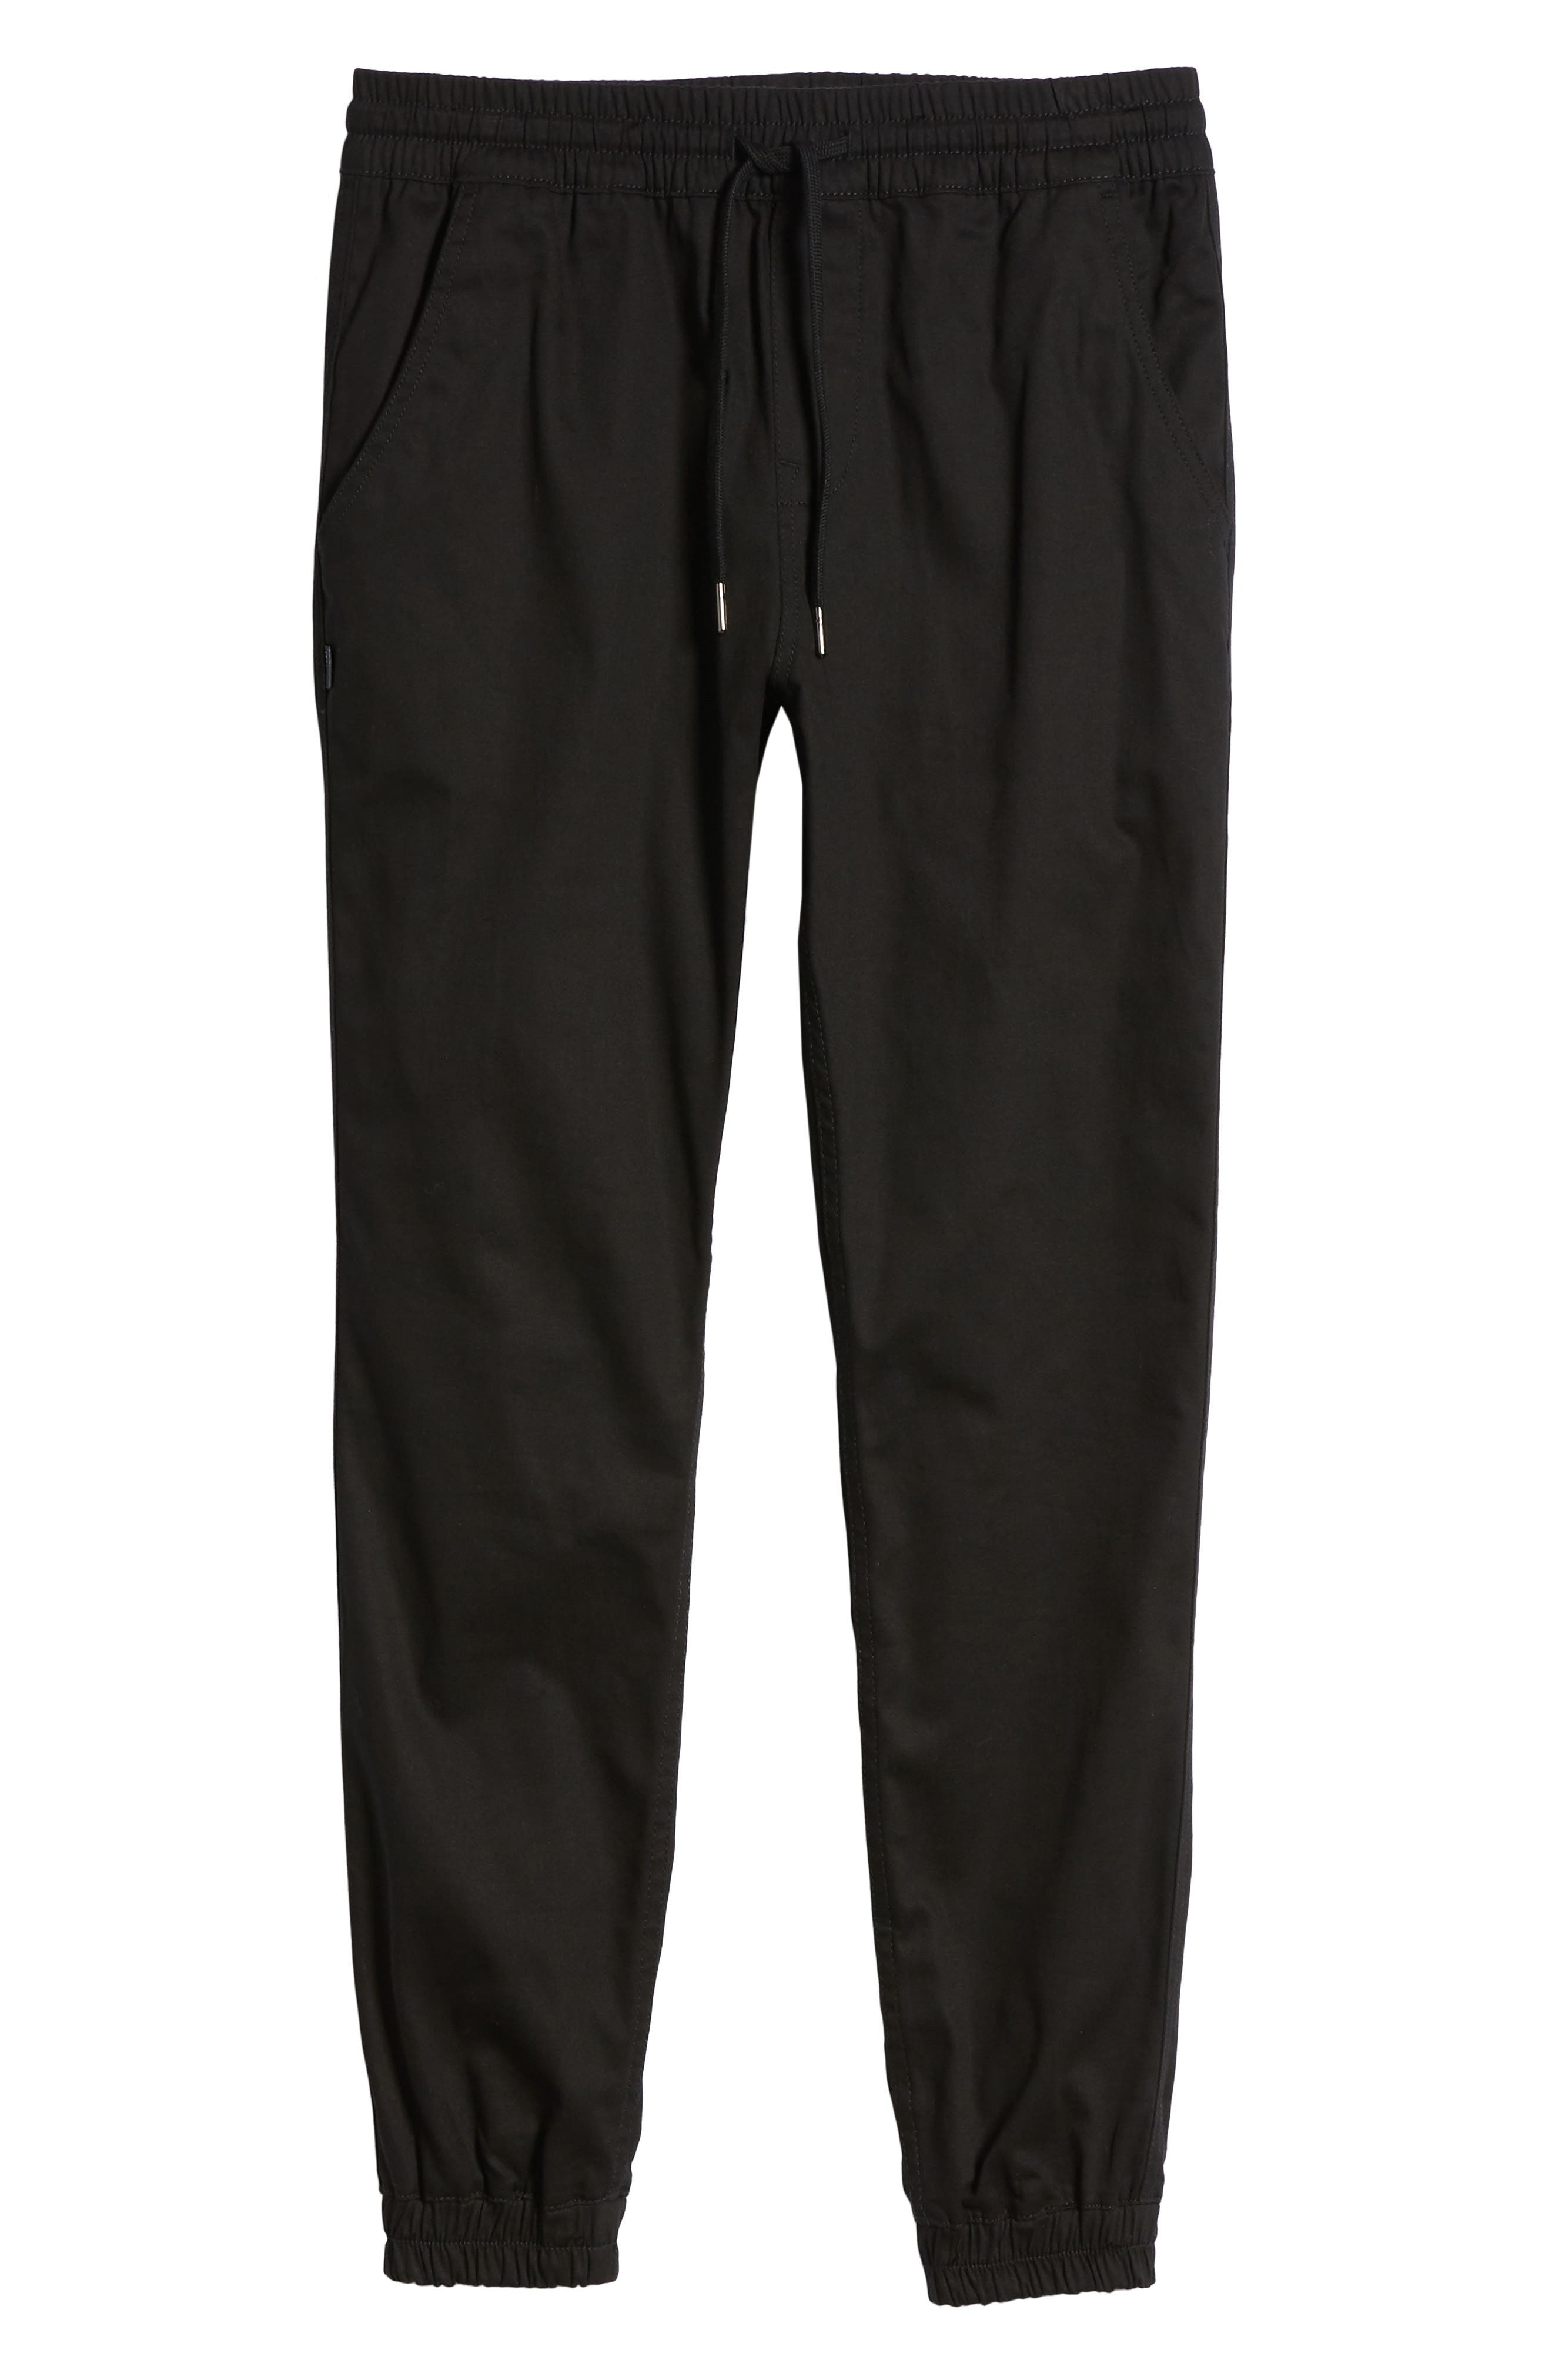 Runner Slim Fit Jogger Pants,                             Alternate thumbnail 6, color,                             Black